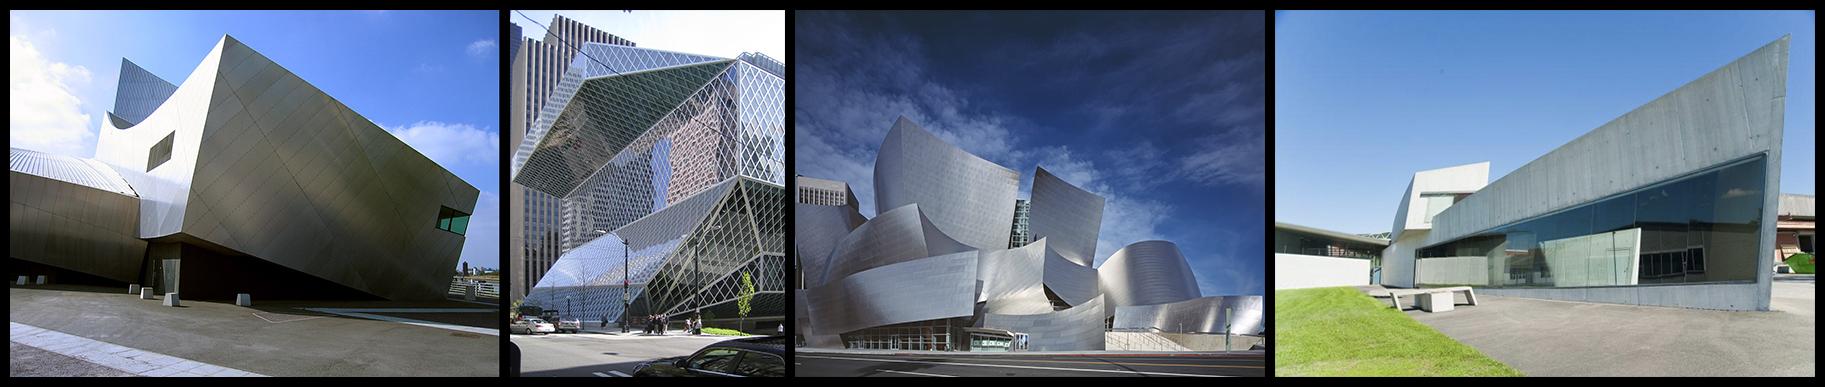 De izqda a dcha: Museo de la Guerra Imperial, Libeskind | Biblioteca Central de Seattle, Koolhaas | Walt Disney Concert Hall, Gehry | Estación de Bomberos Vitra, Zaha Hadid